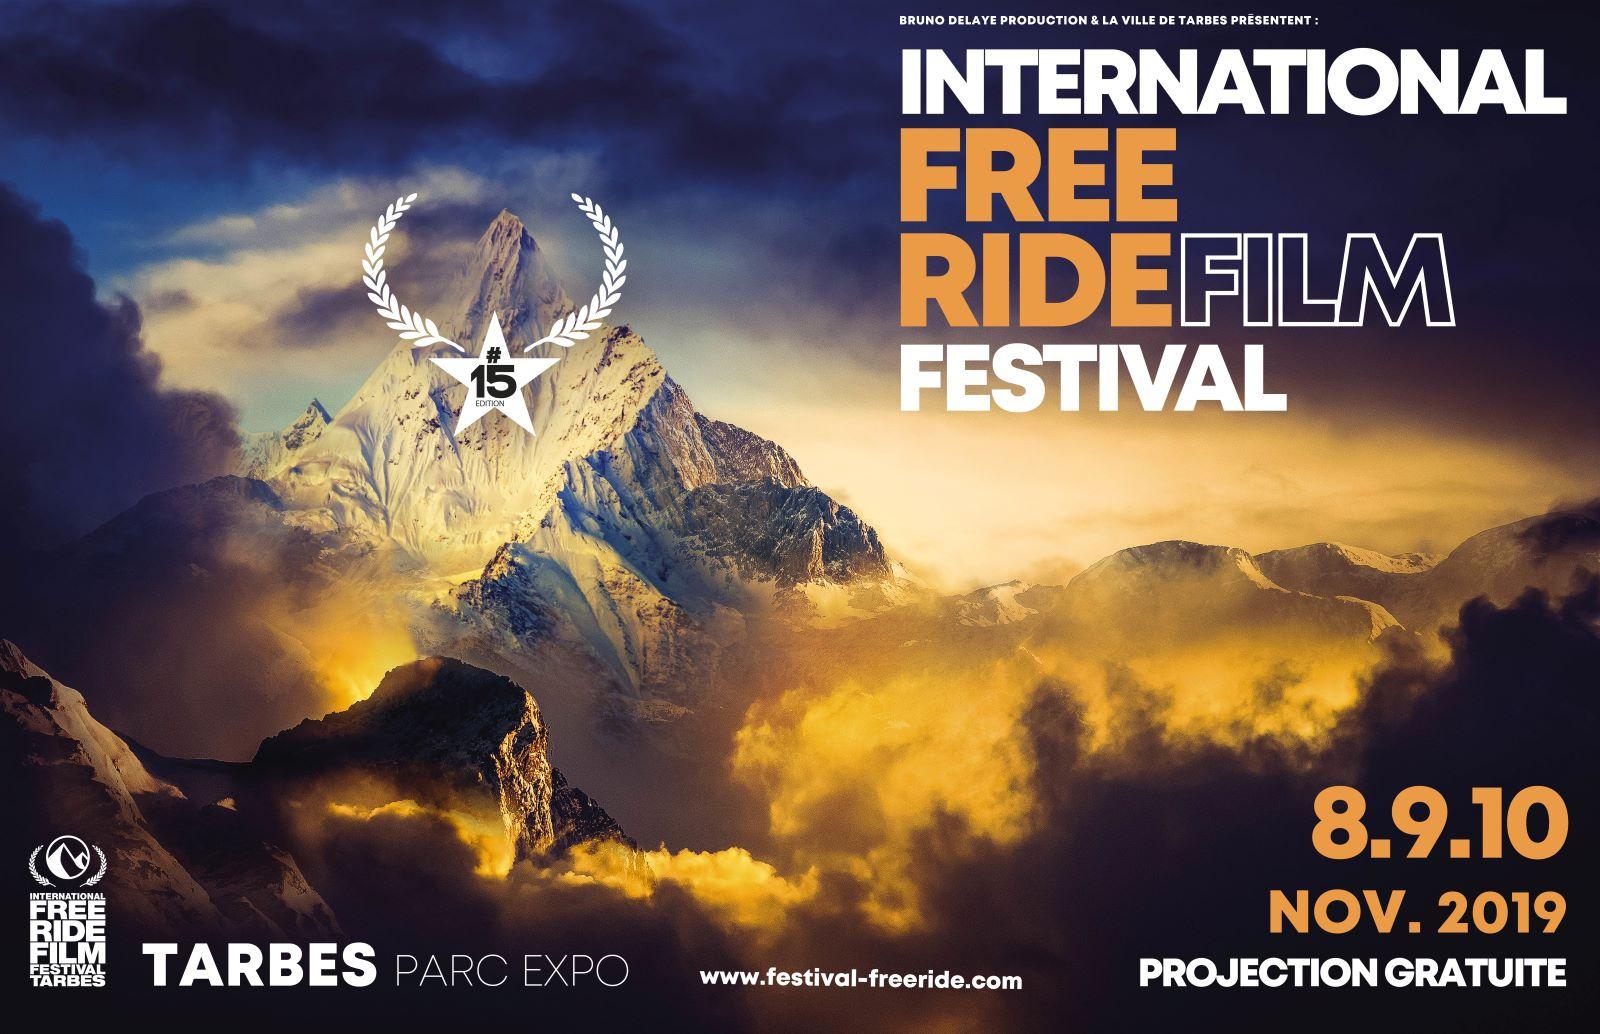 International free ride film fest